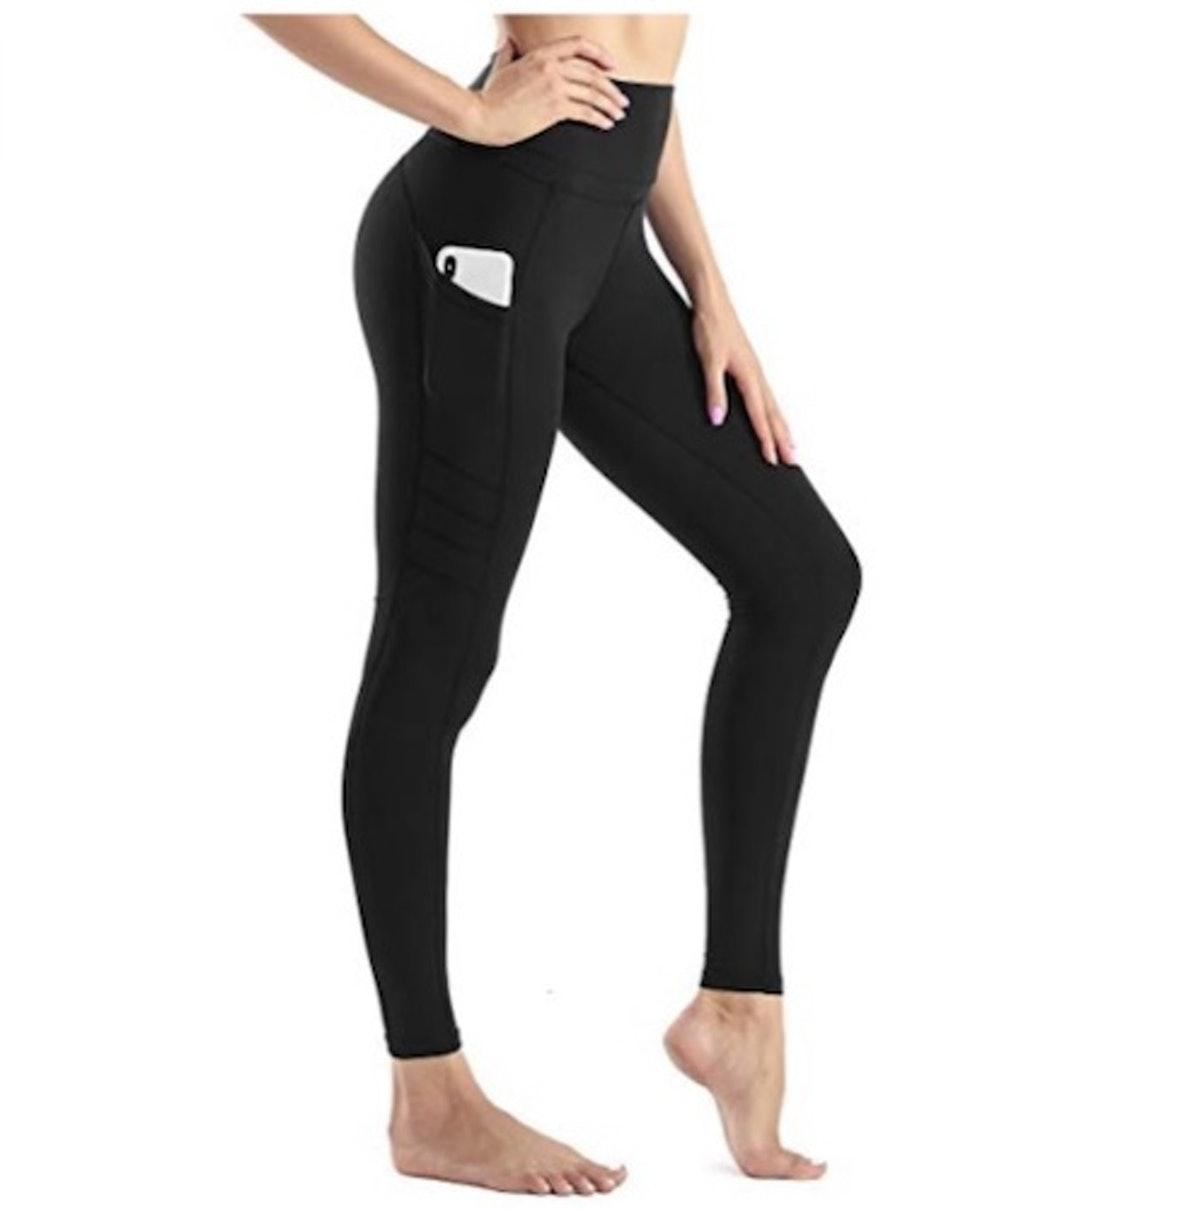 Sunzel Yoga Pants with Pockets